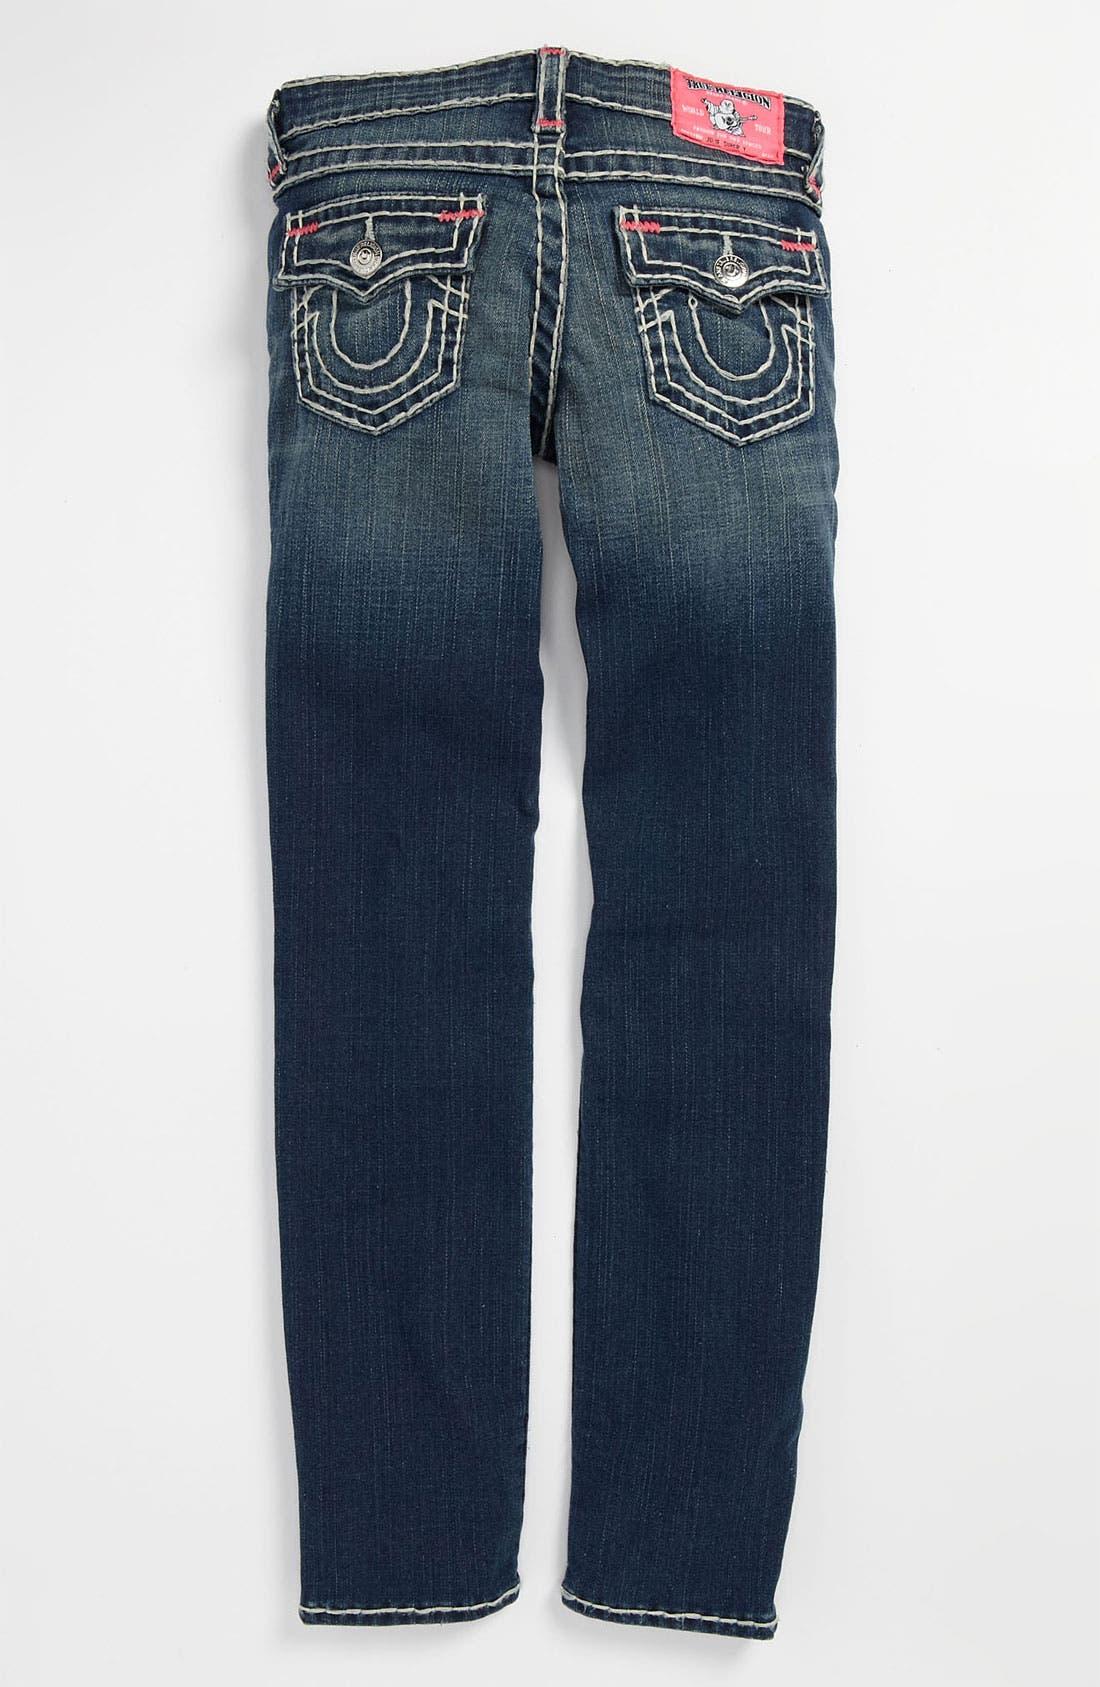 Alternate Image 1 Selected - True Religion Brand Jeans 'Bartack - Super T' Straight Leg Jeans (Little Girls & Big Girls)